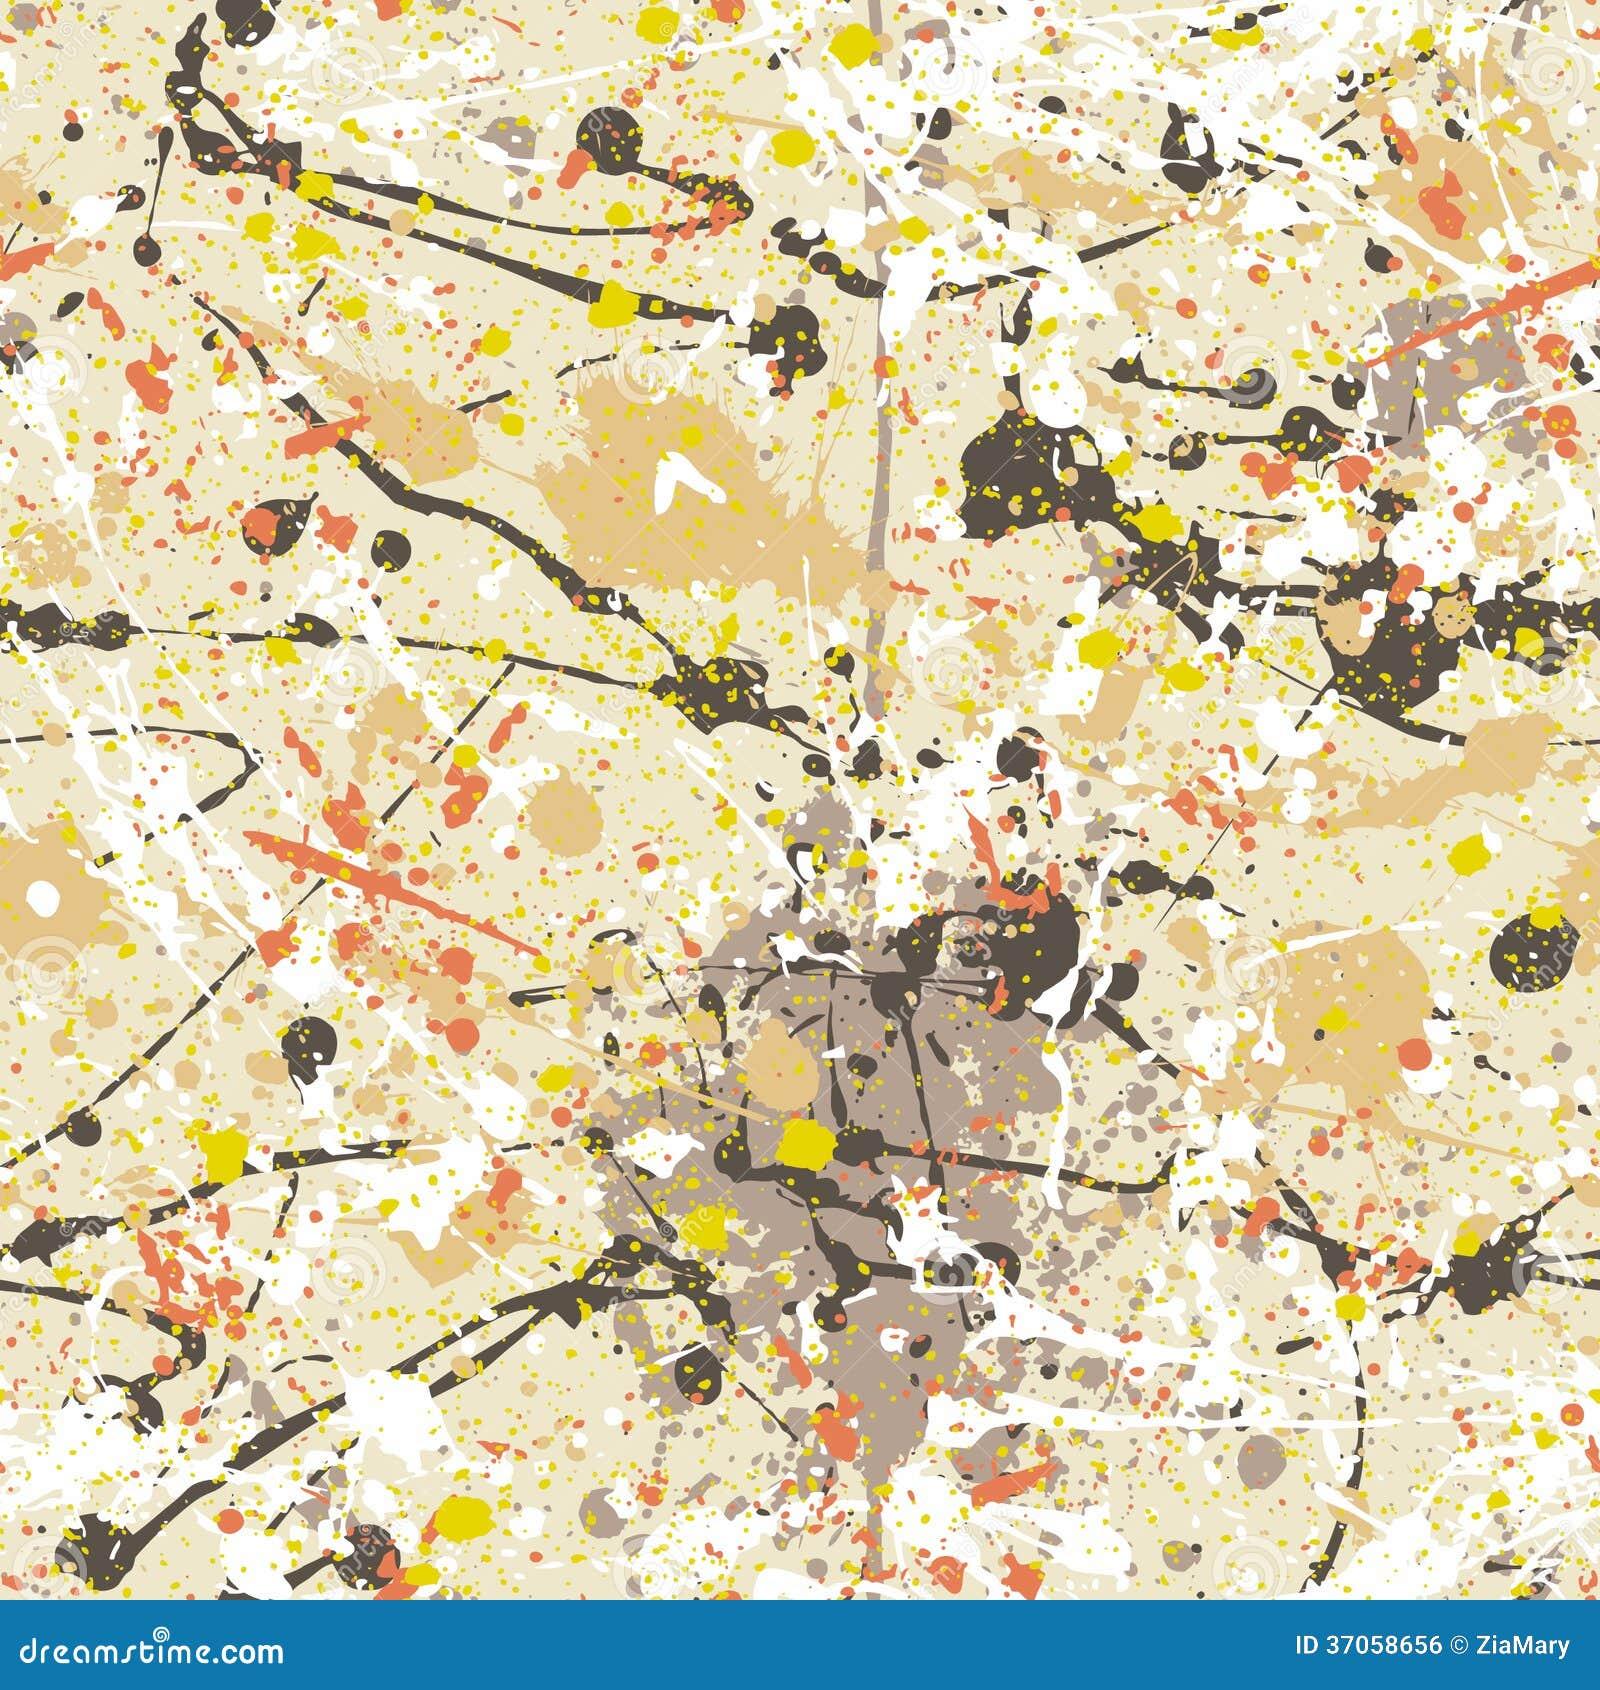 Splatter Paint Wallpaper Royalty Free Stock Image Image